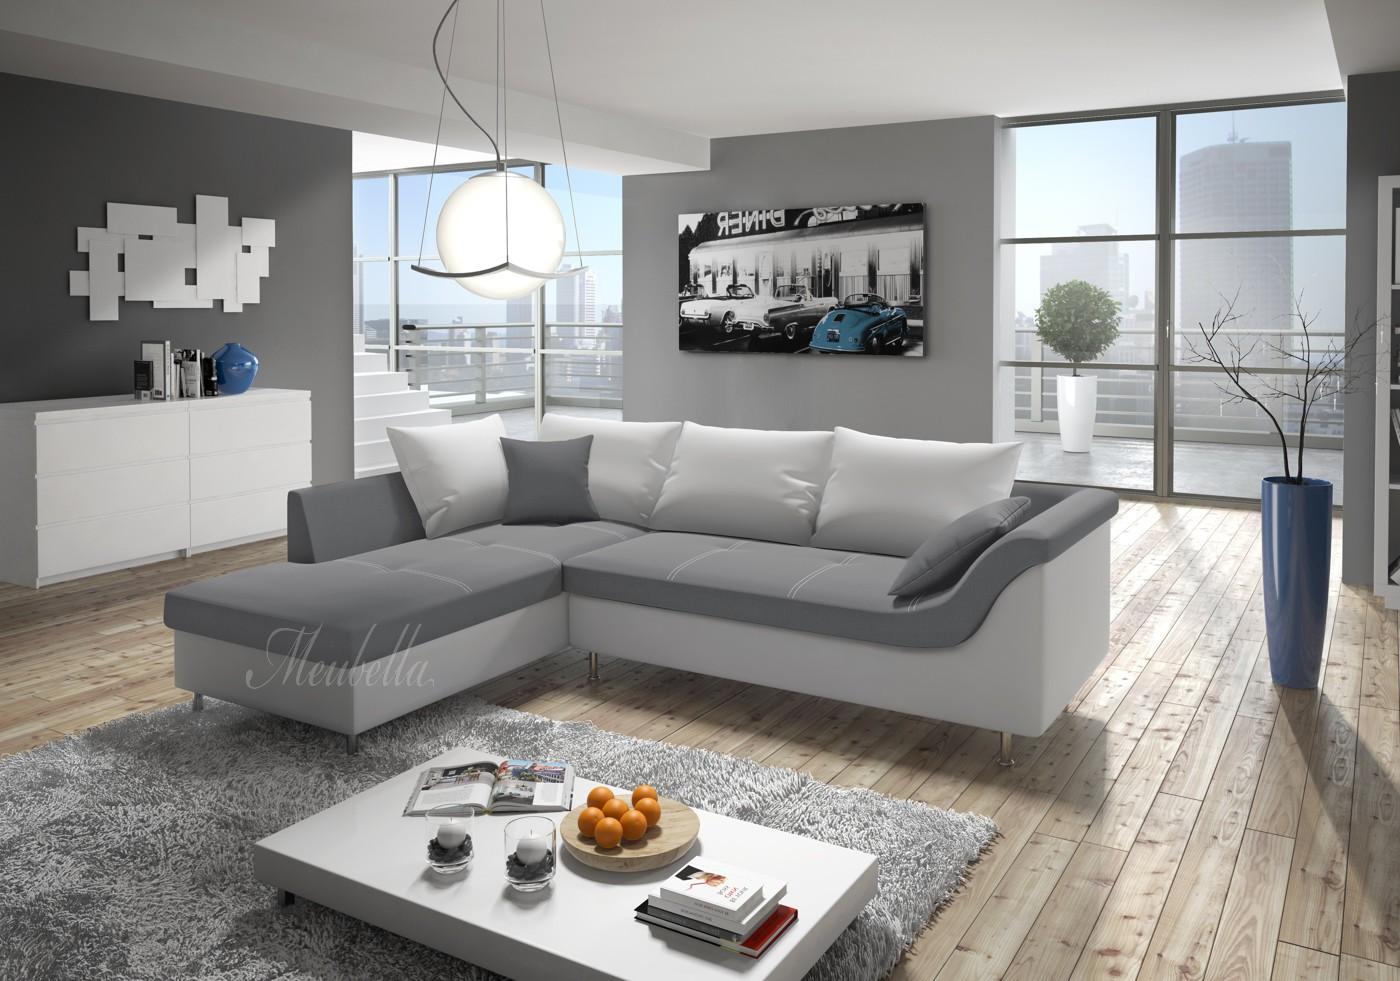 Woonkamer Wit Grijs: Moderne woonkamer inspiratie wit grijs ...